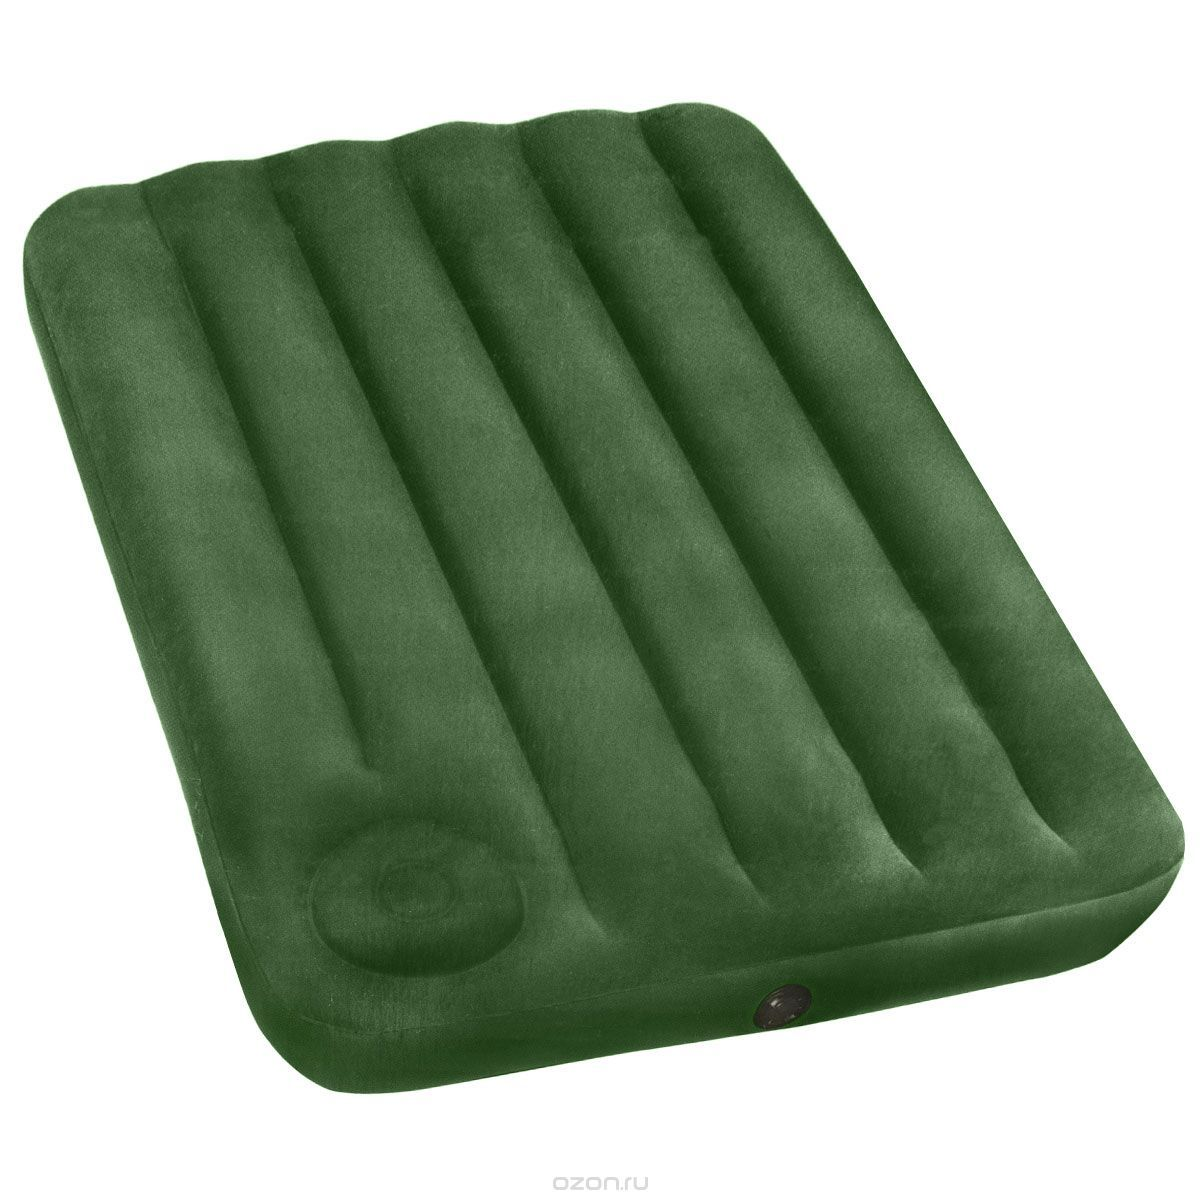 Надувной матрас Intex (66927) Downy Bed